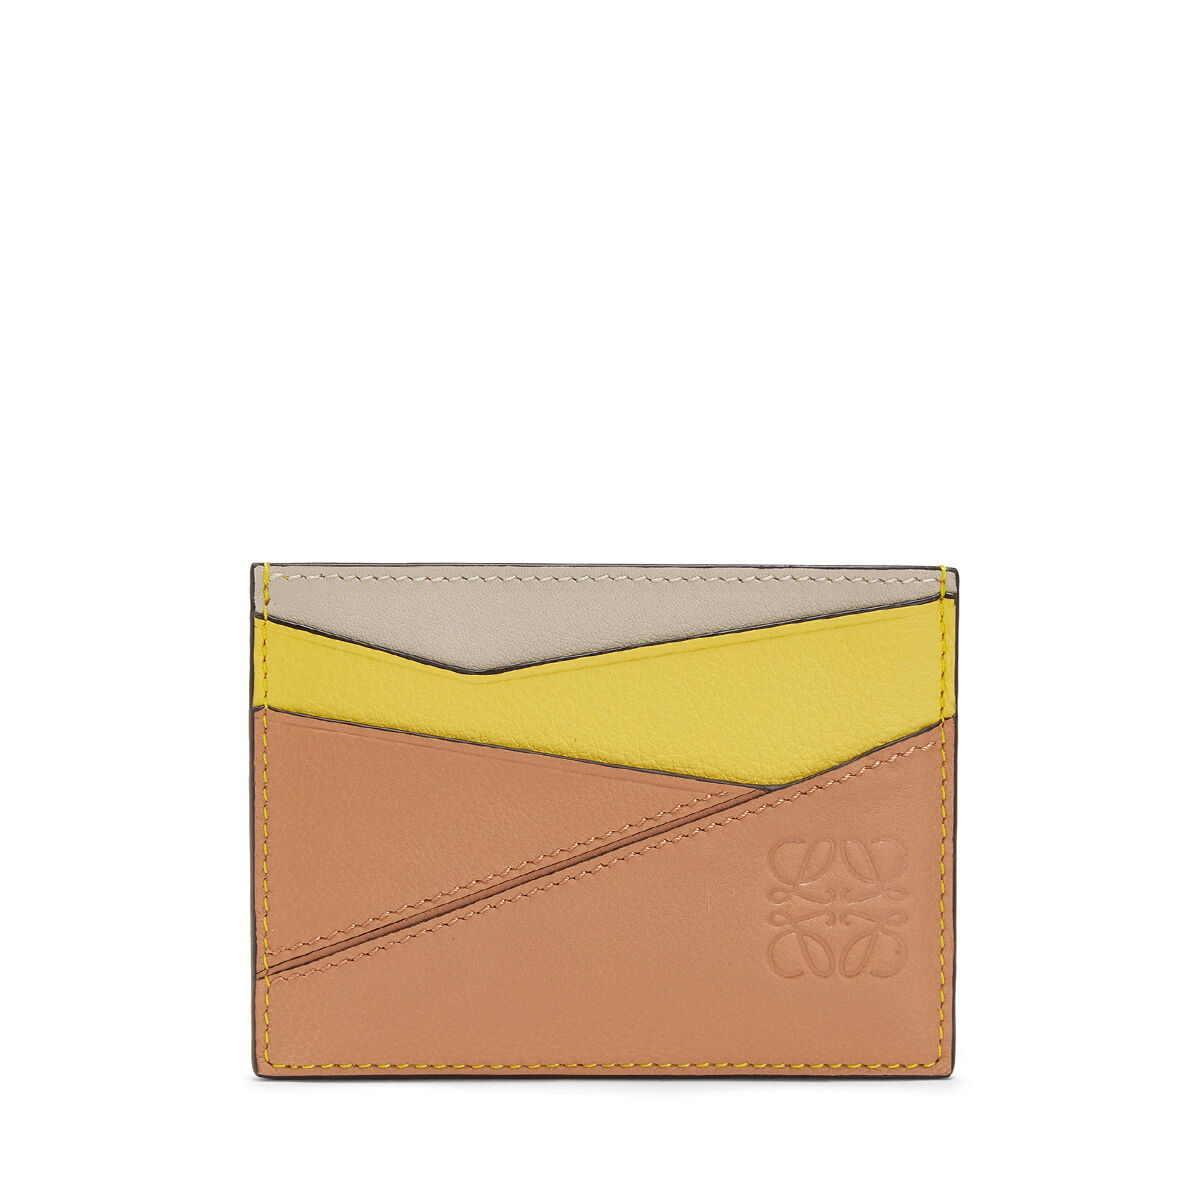 LOEWE Puzzle Plain Card Holder Yellow/Powder all